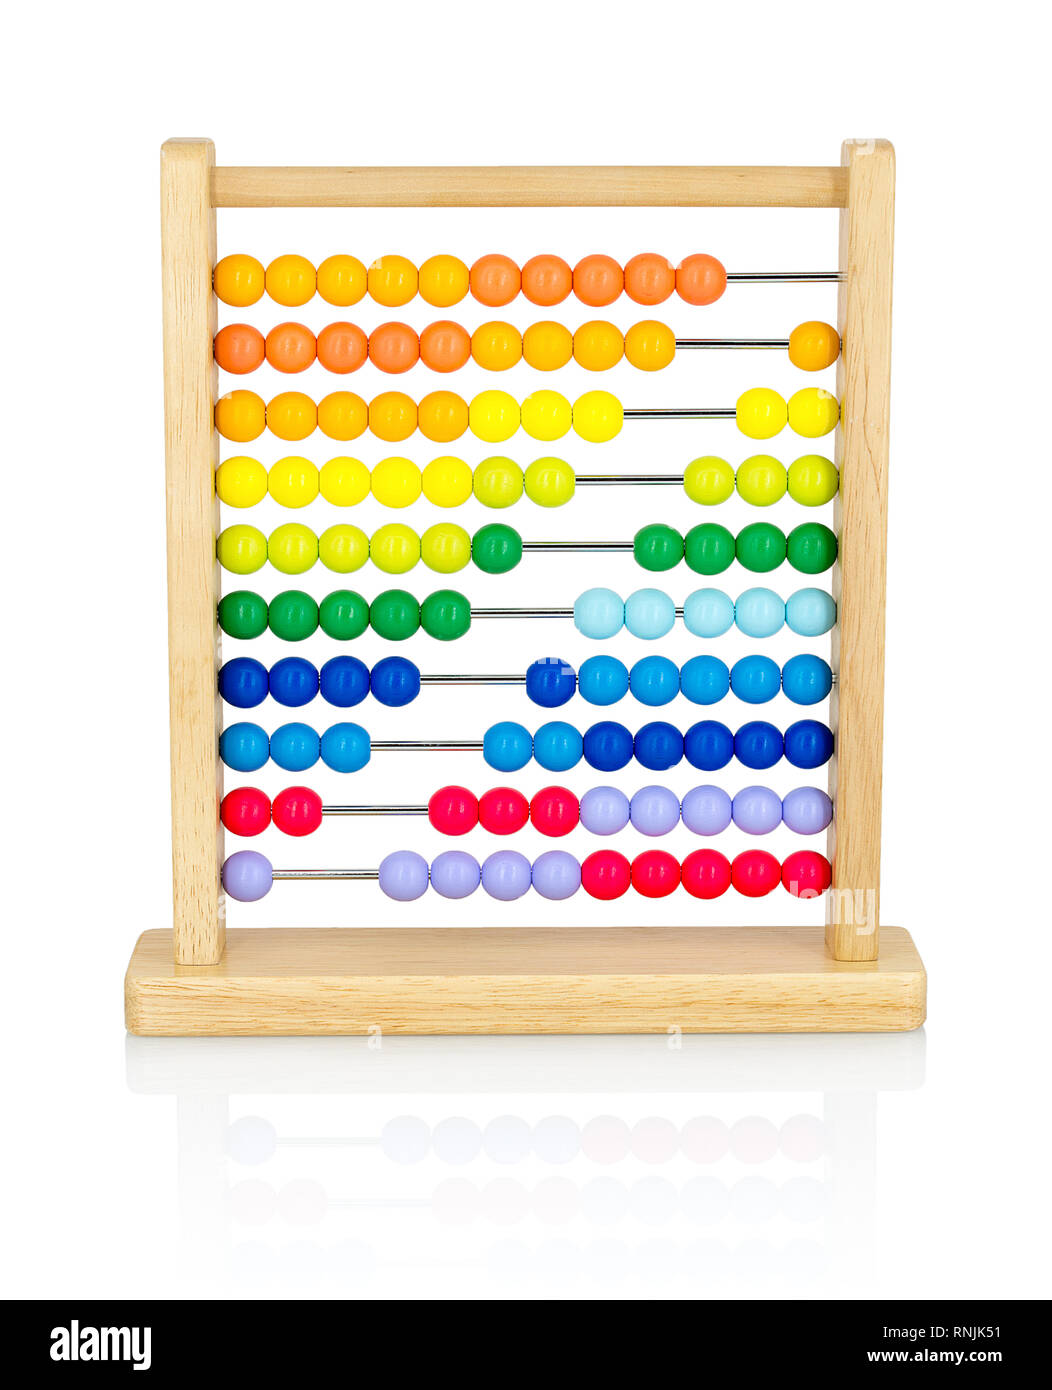 Kinder aus Holz Abakus Spielzeug Perlen Anzahl Maths Educational Kids